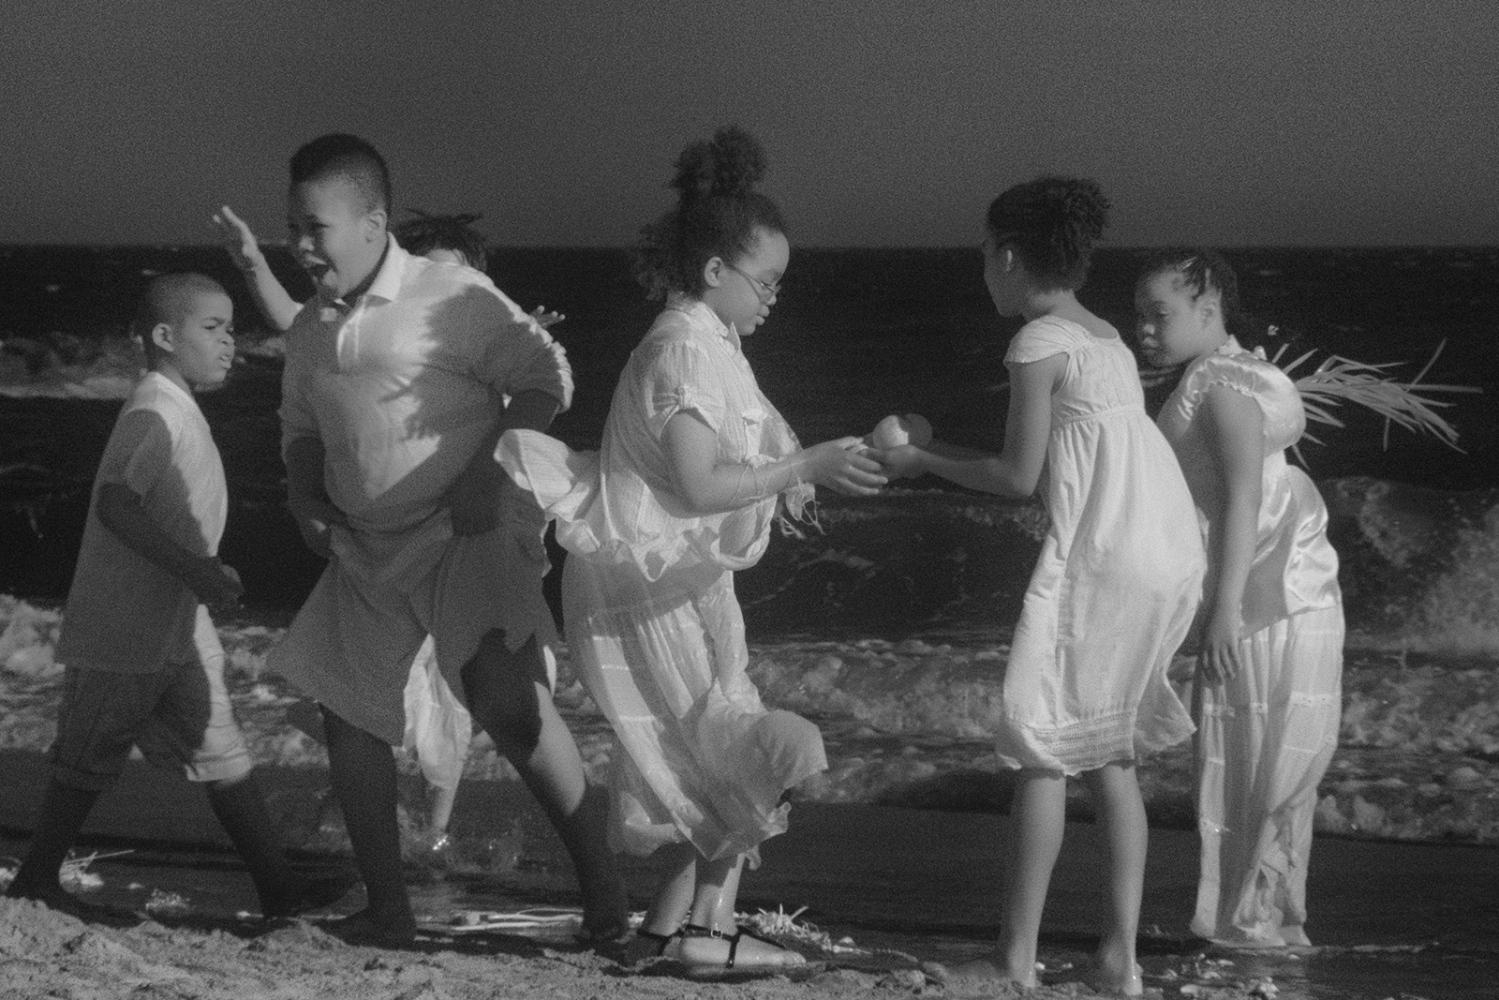 Art and Documentary Photography - Loading 33-michael-websterDSIR1481.jpg